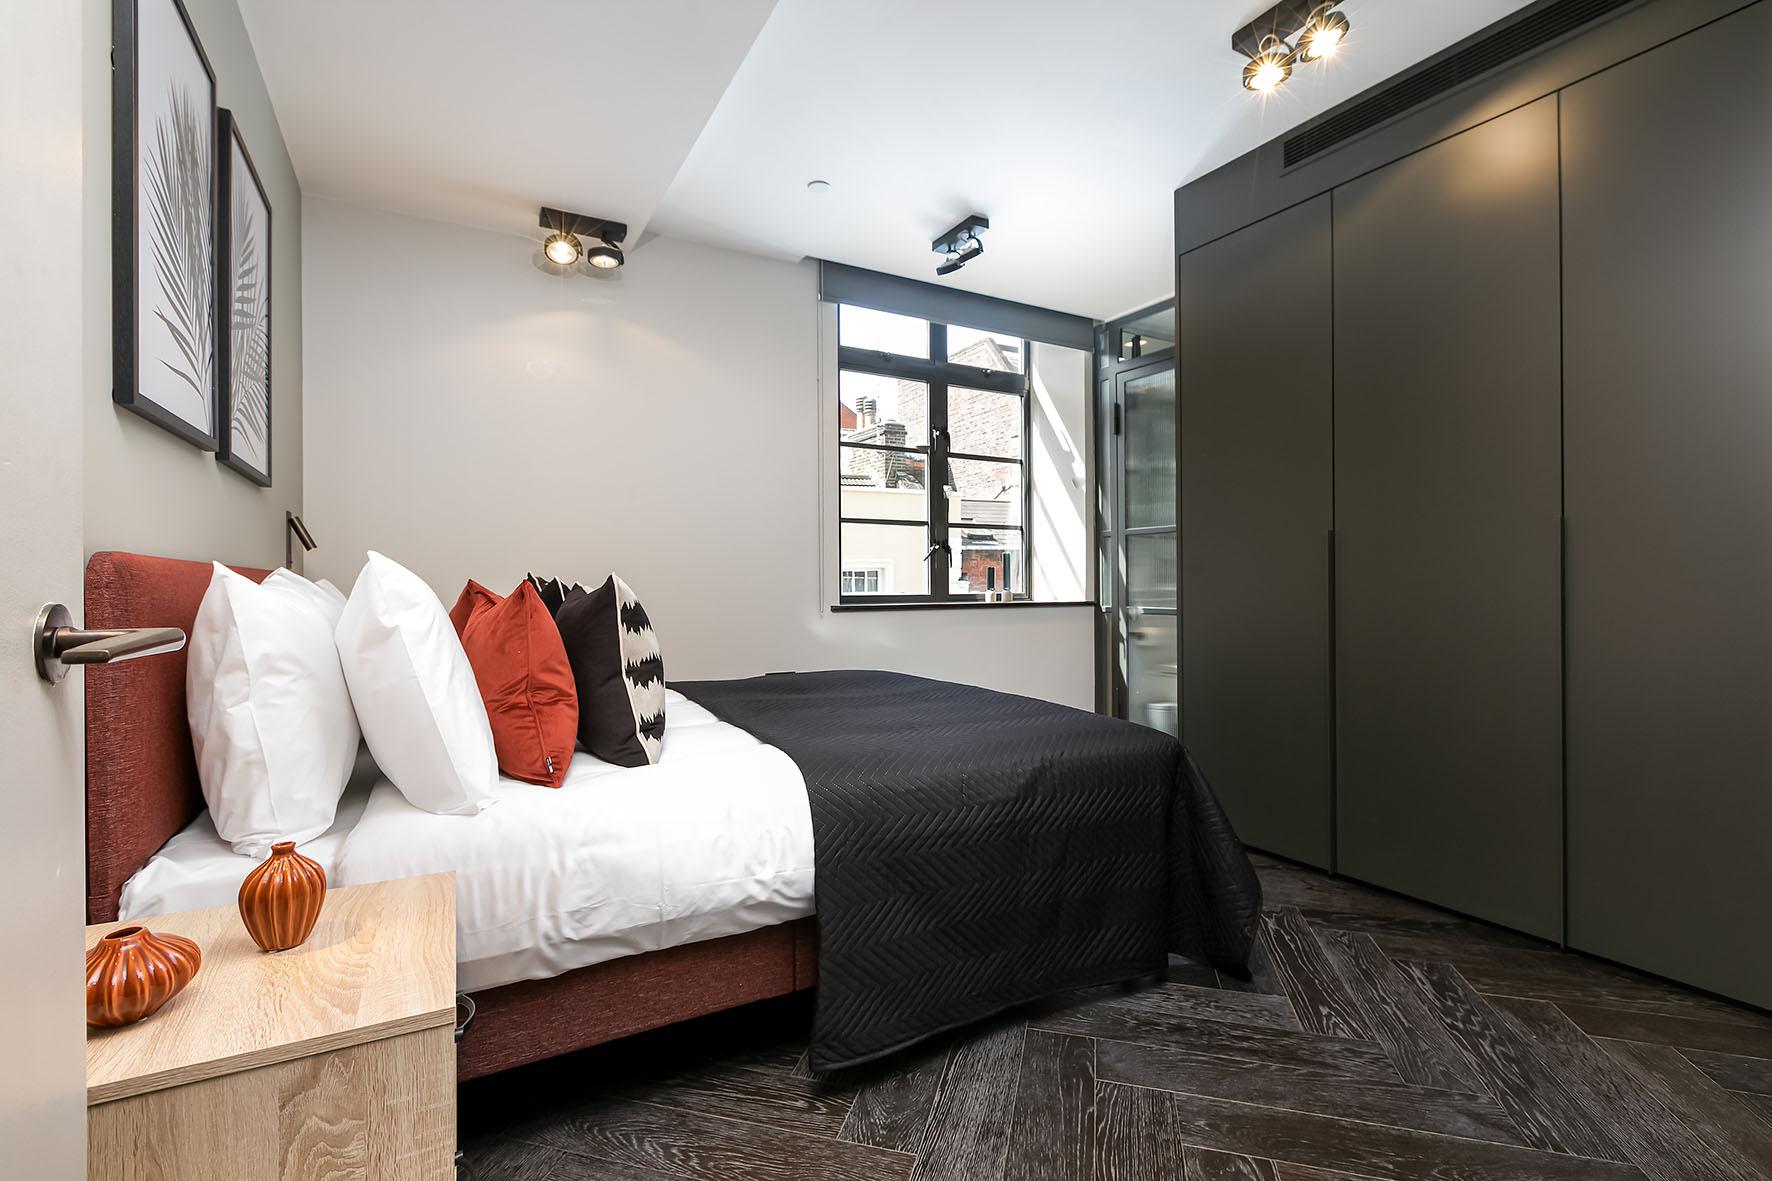 Lovelydays luxury service apartment rental - London - Soho - Oxford Street IV - Lovelysuite - 2 bedrooms - 2 bathrooms - Queen bed - 9ba469c5bd26 - Lovelydays